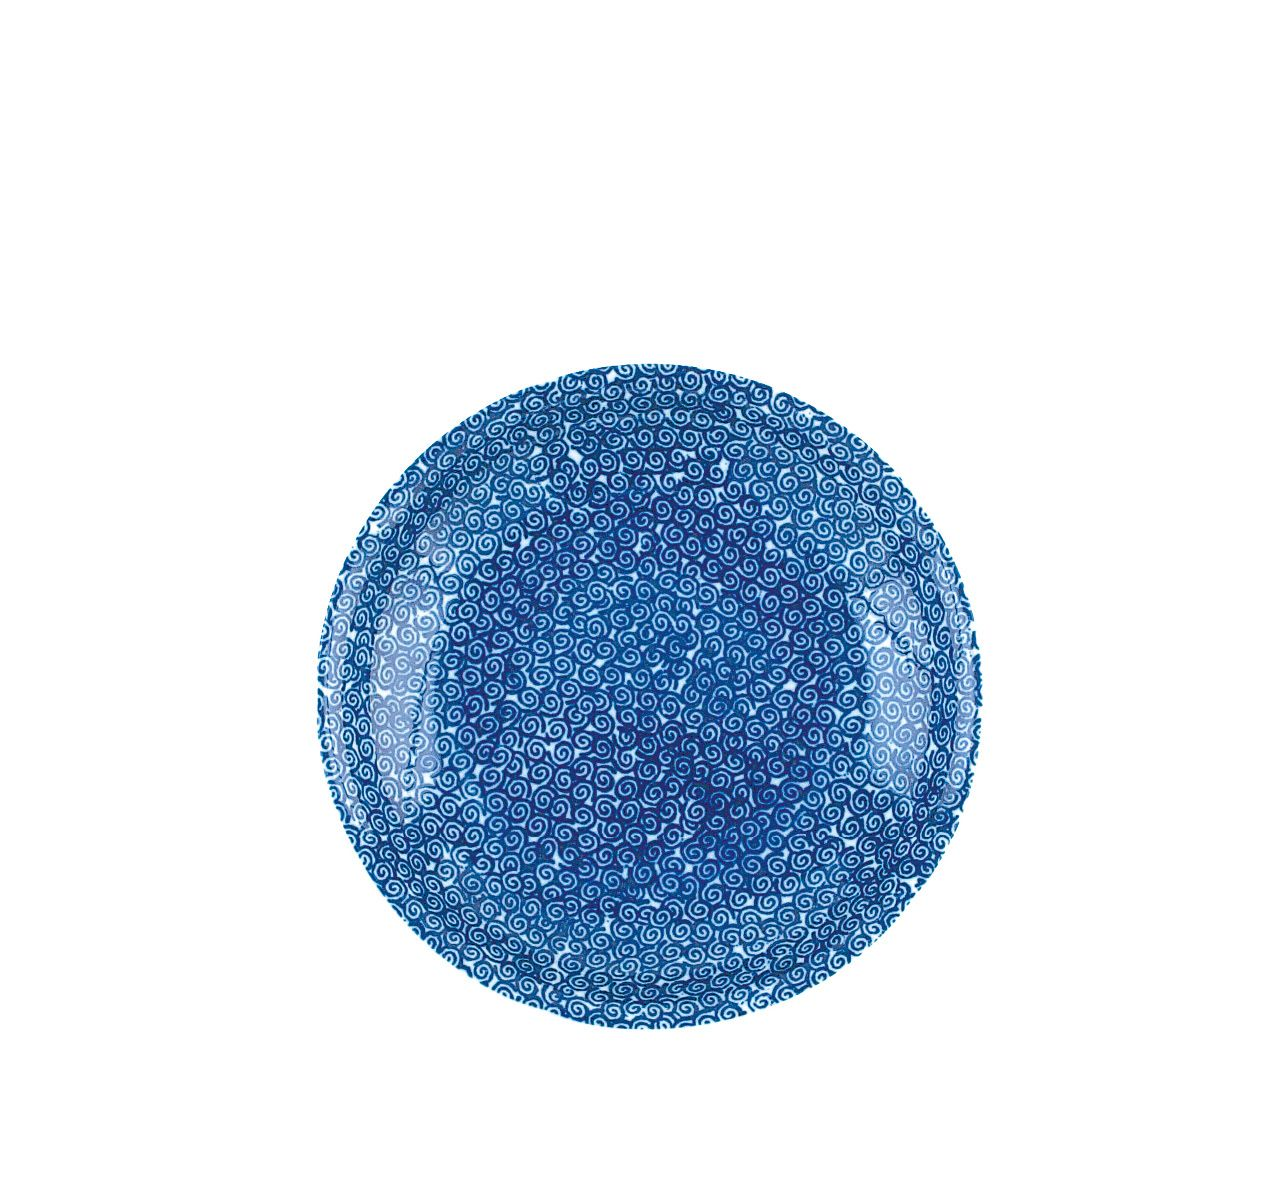 The White Snow Agadir - Round Serving Bowl 1 Blue Pattern